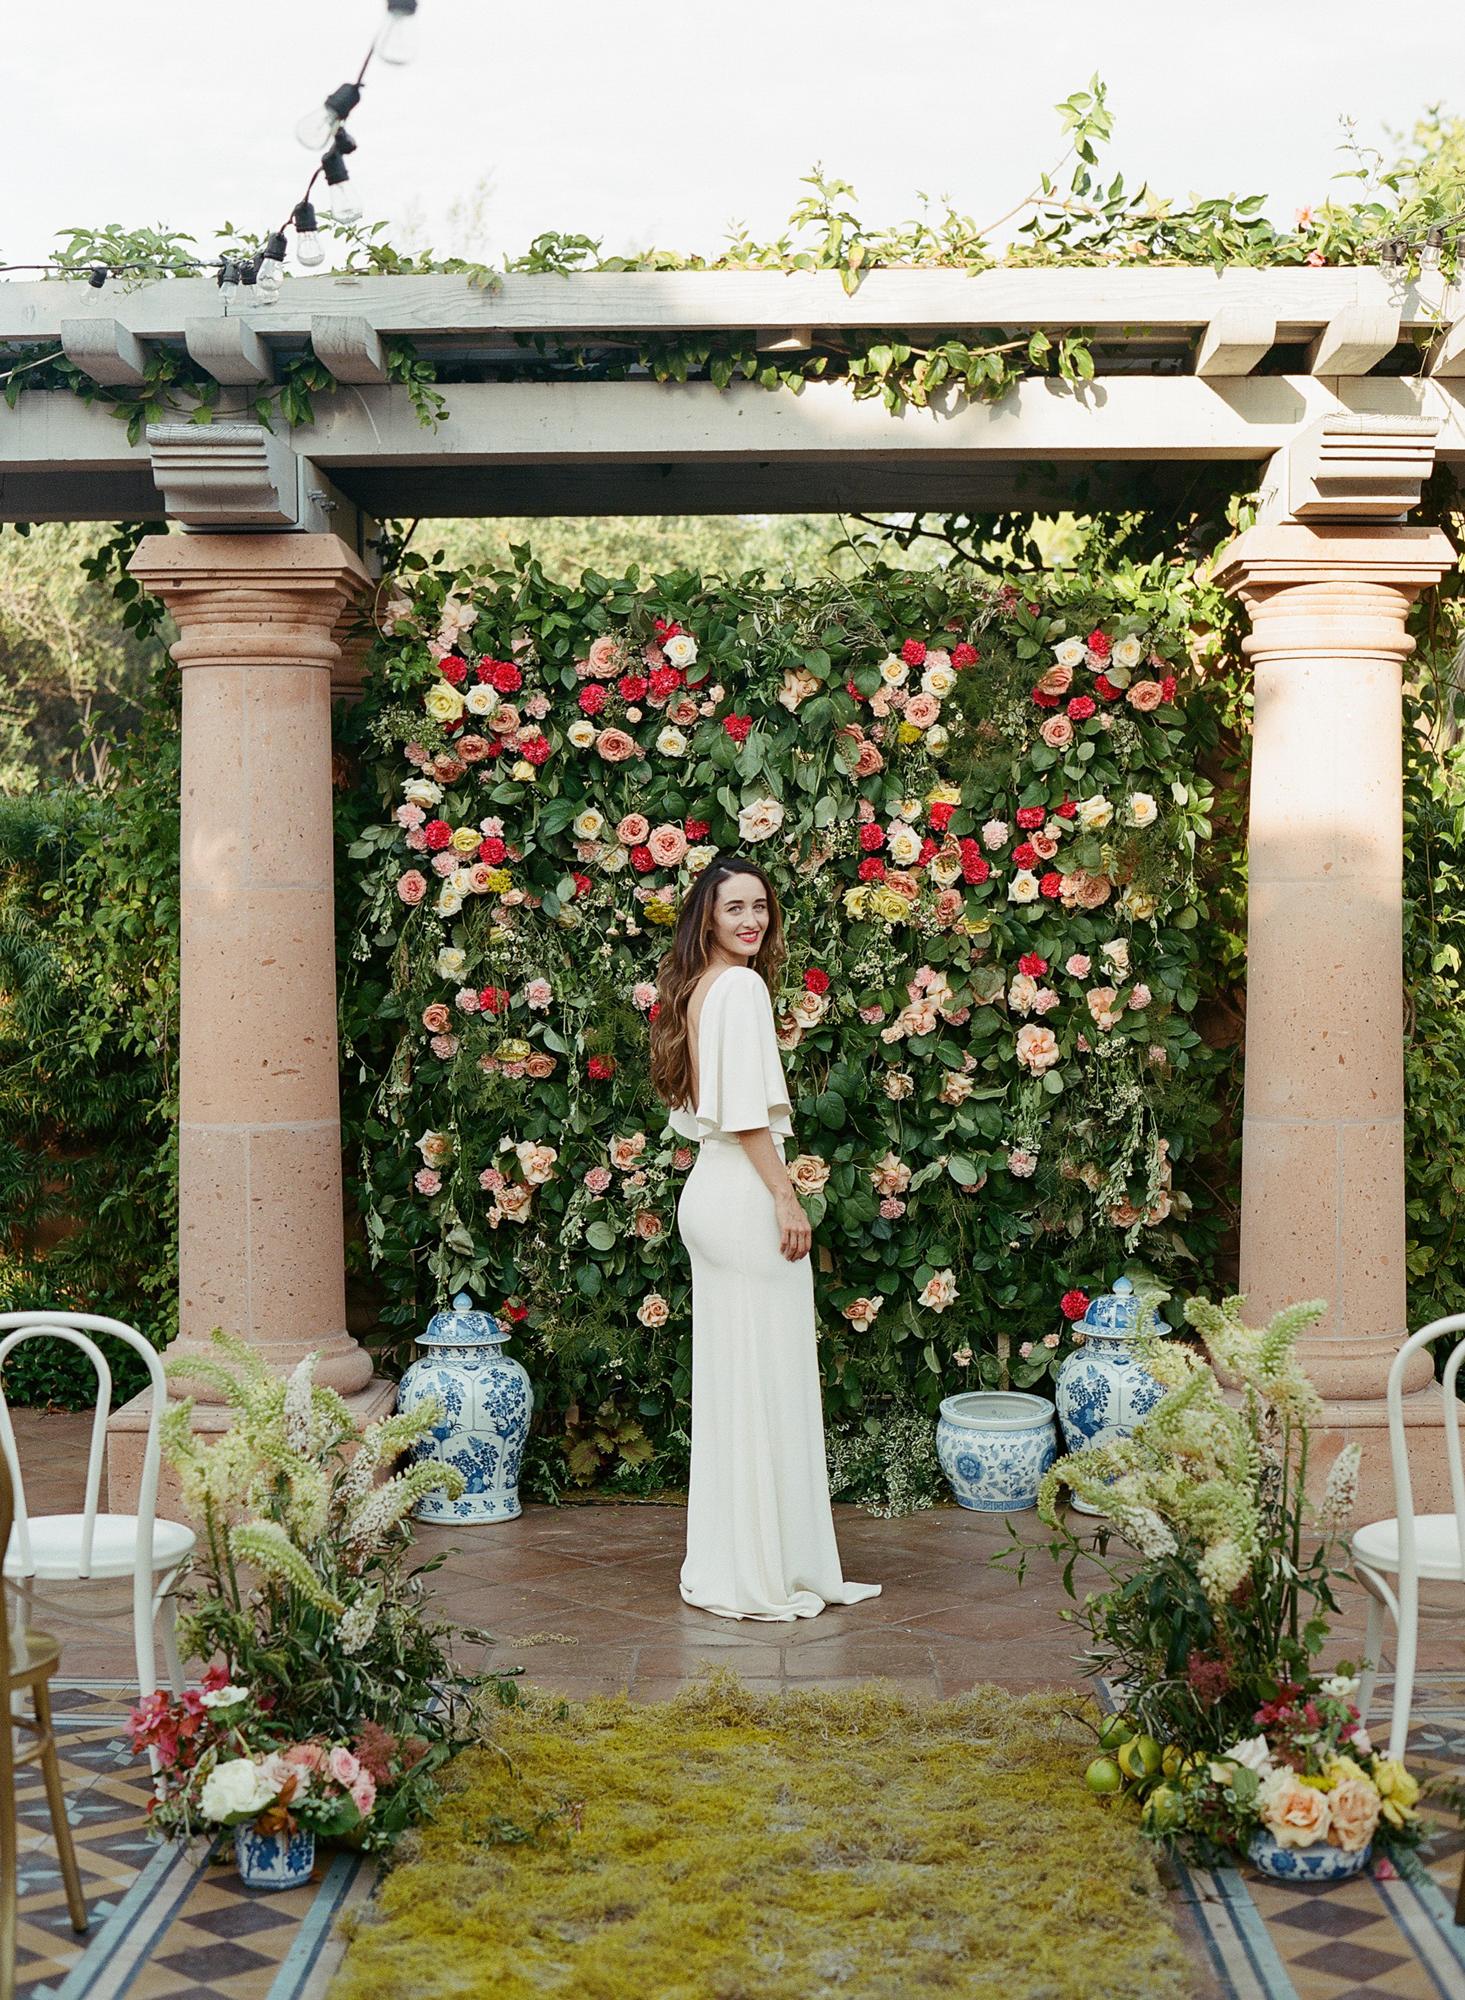 Rancho-Valencia-wedding-blooms-by-breesa-lee-rochelle-cheever-francine-ribeau-luxury-garden-rancho-santa-fe-hey-there-cupcake-adore-folklore-326.JPG